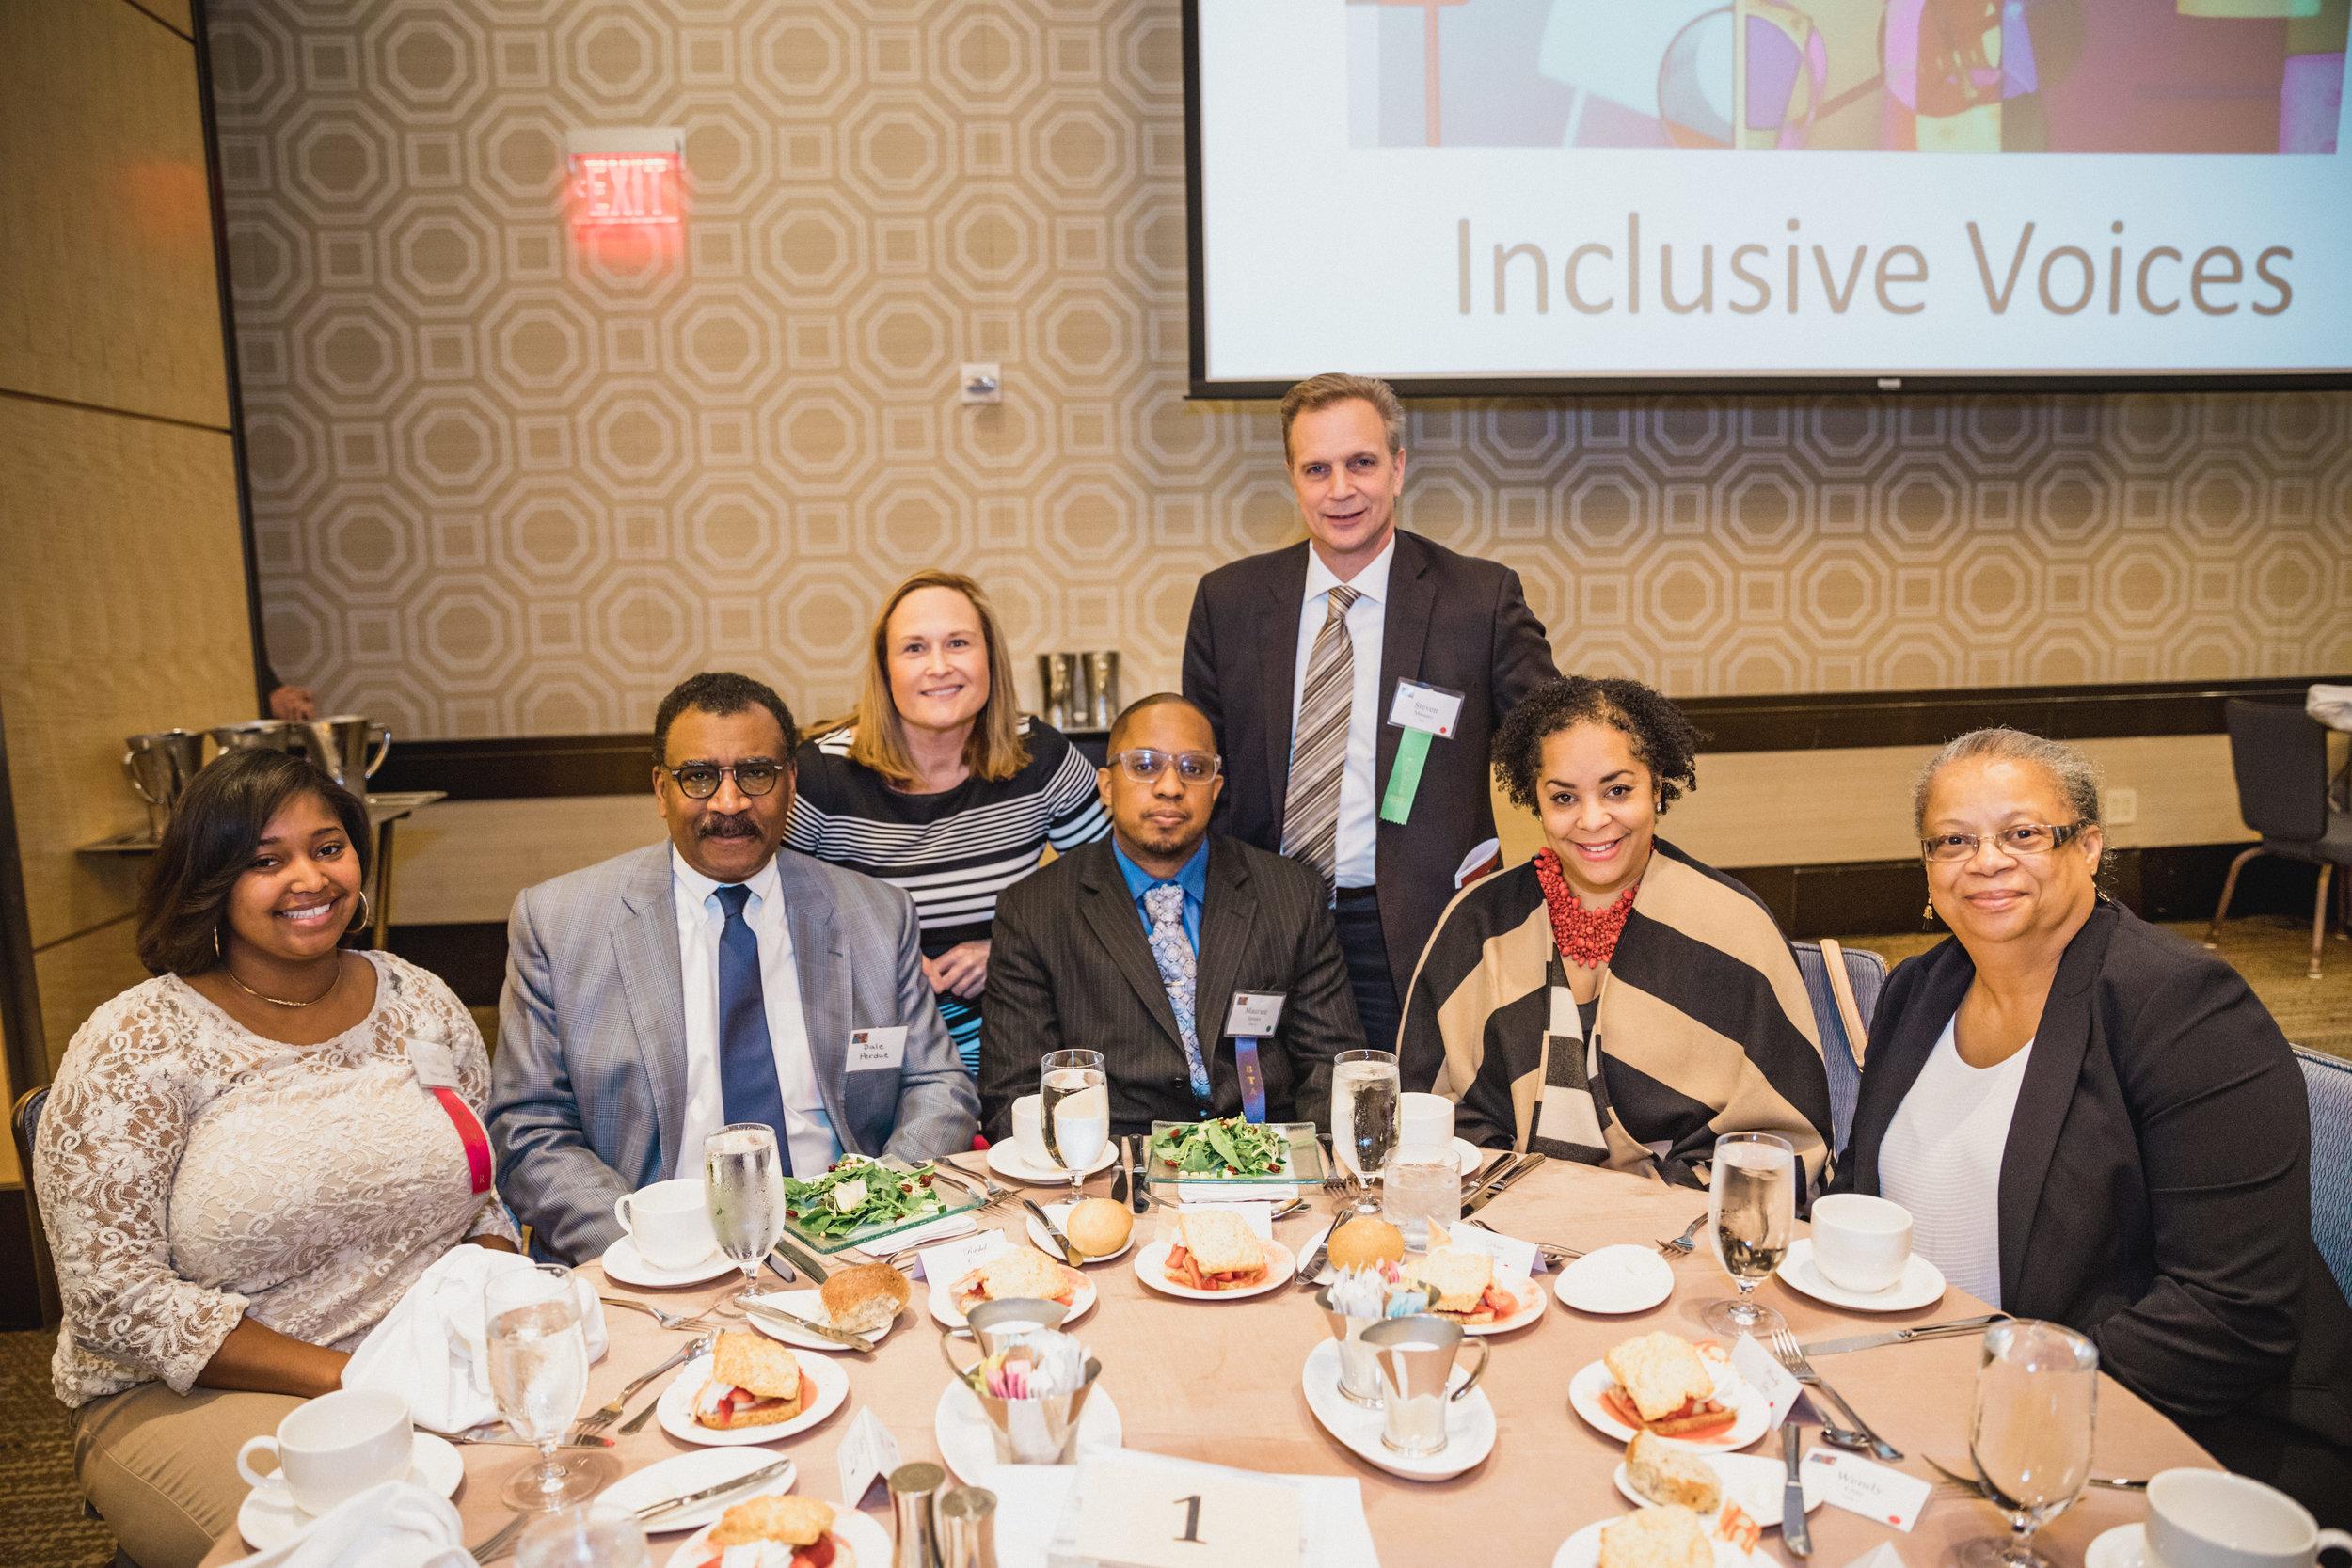 Inclusive Voices 2017-172.jpg